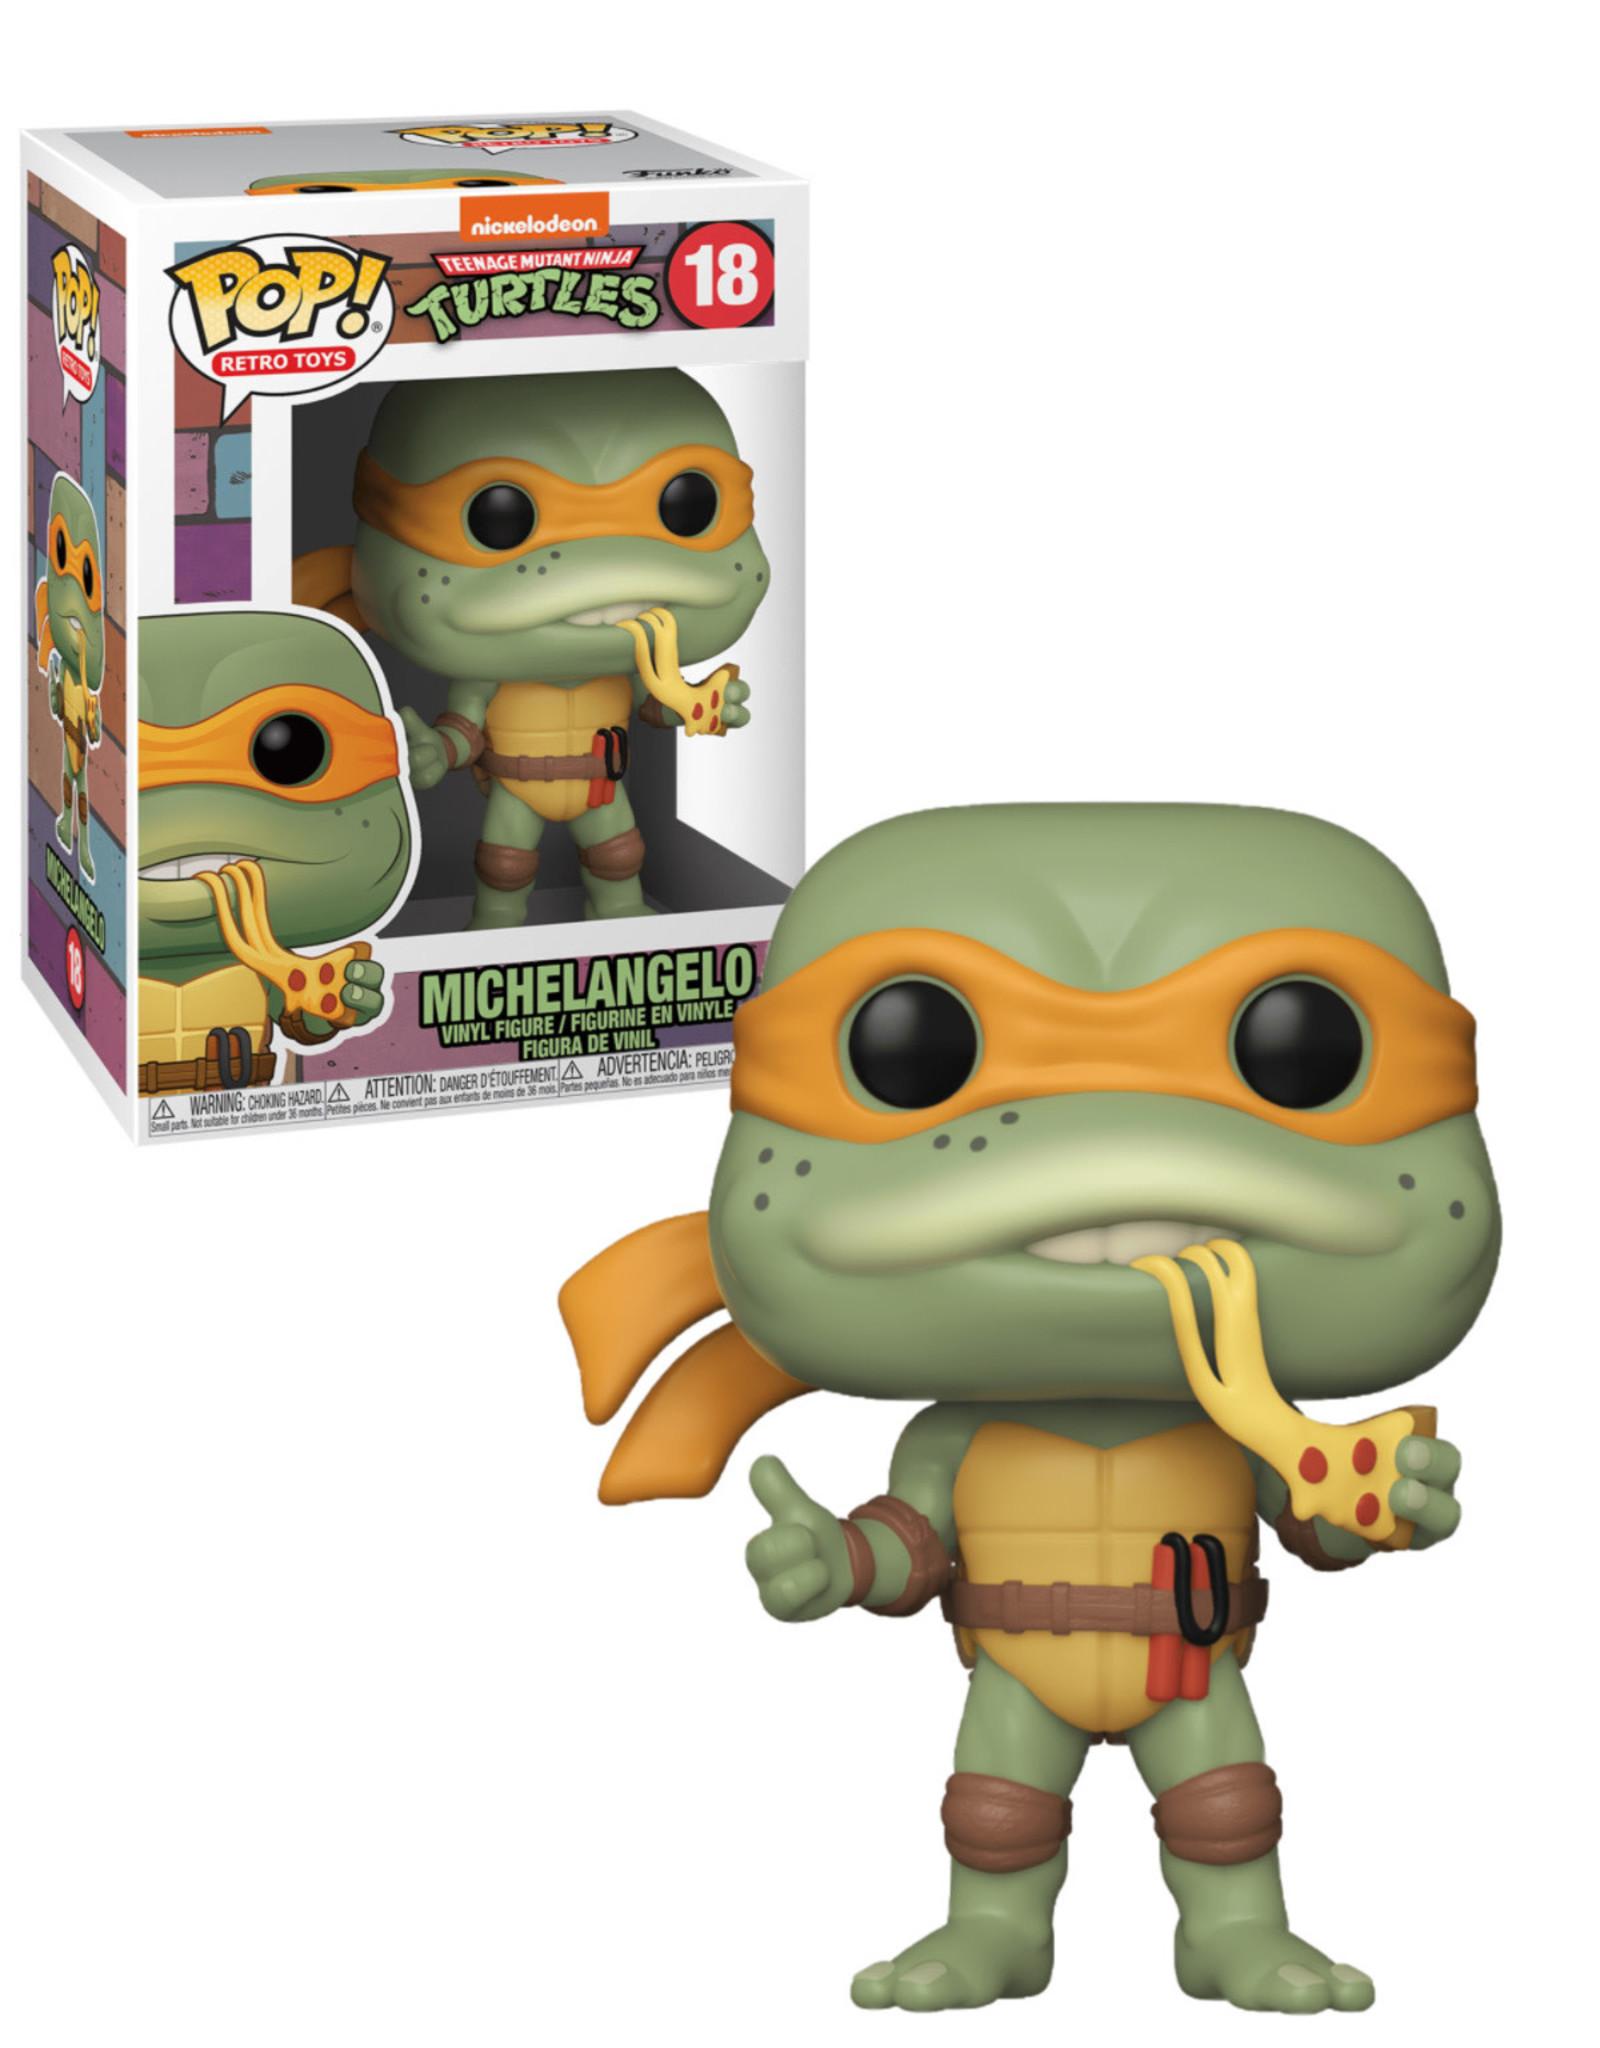 Teenage Mutant Ninja Turtles 18 ( Funko Pop ) Michelangelo